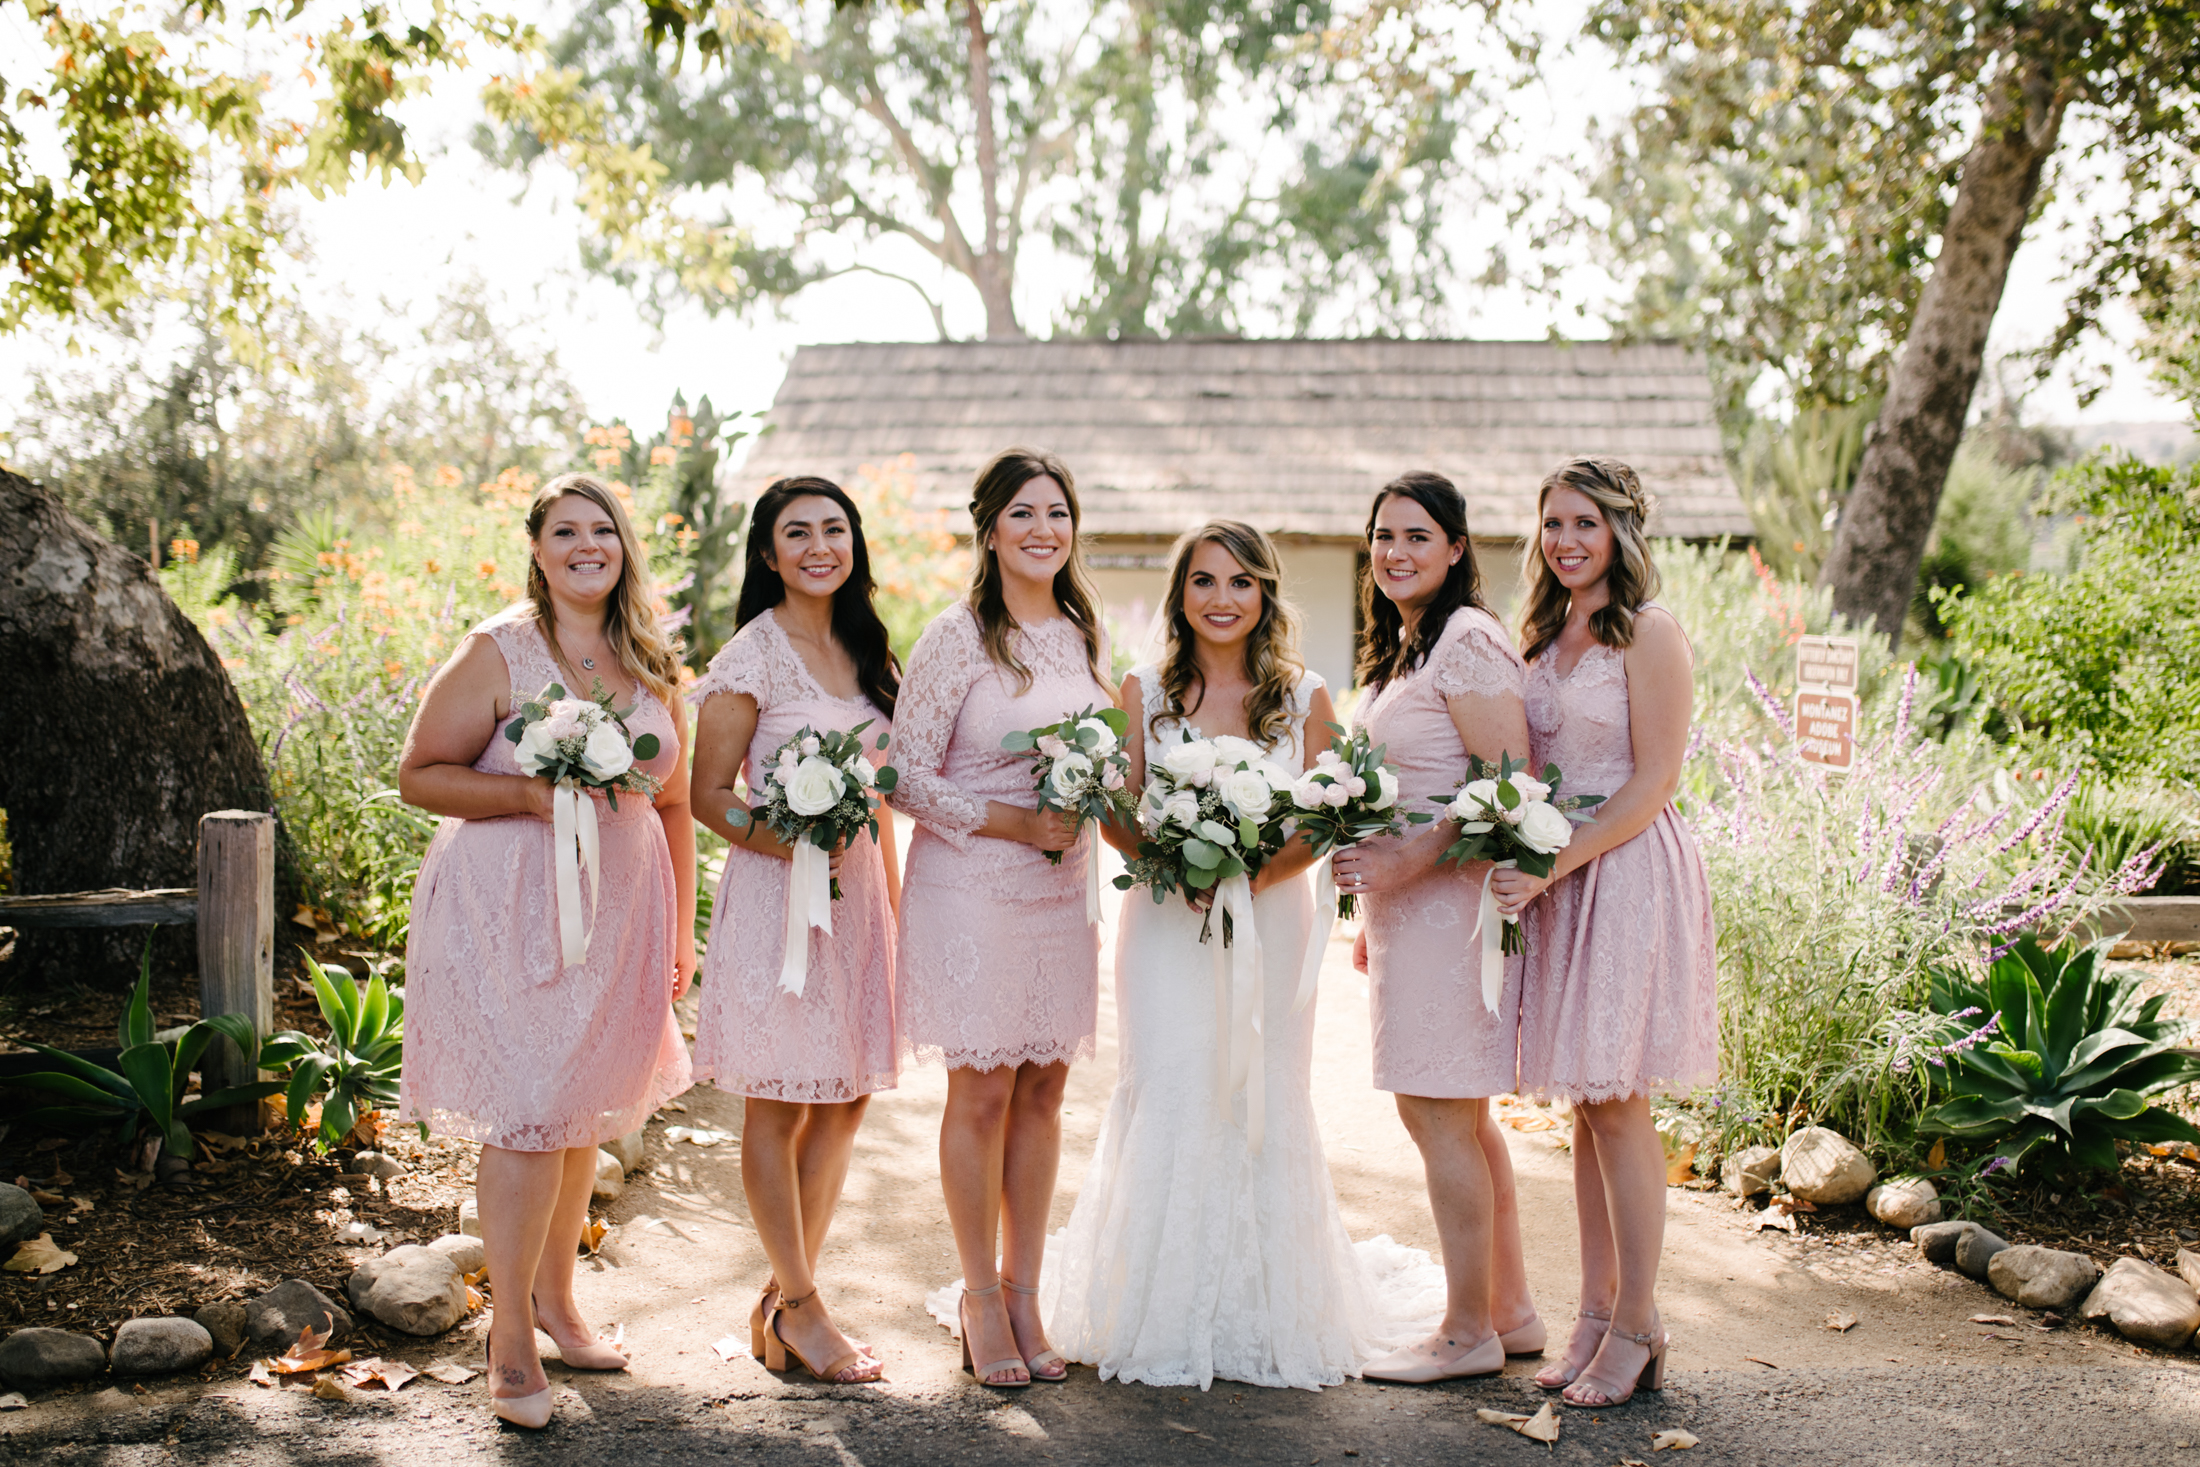 franciscan_garden_wedding-29.jpg